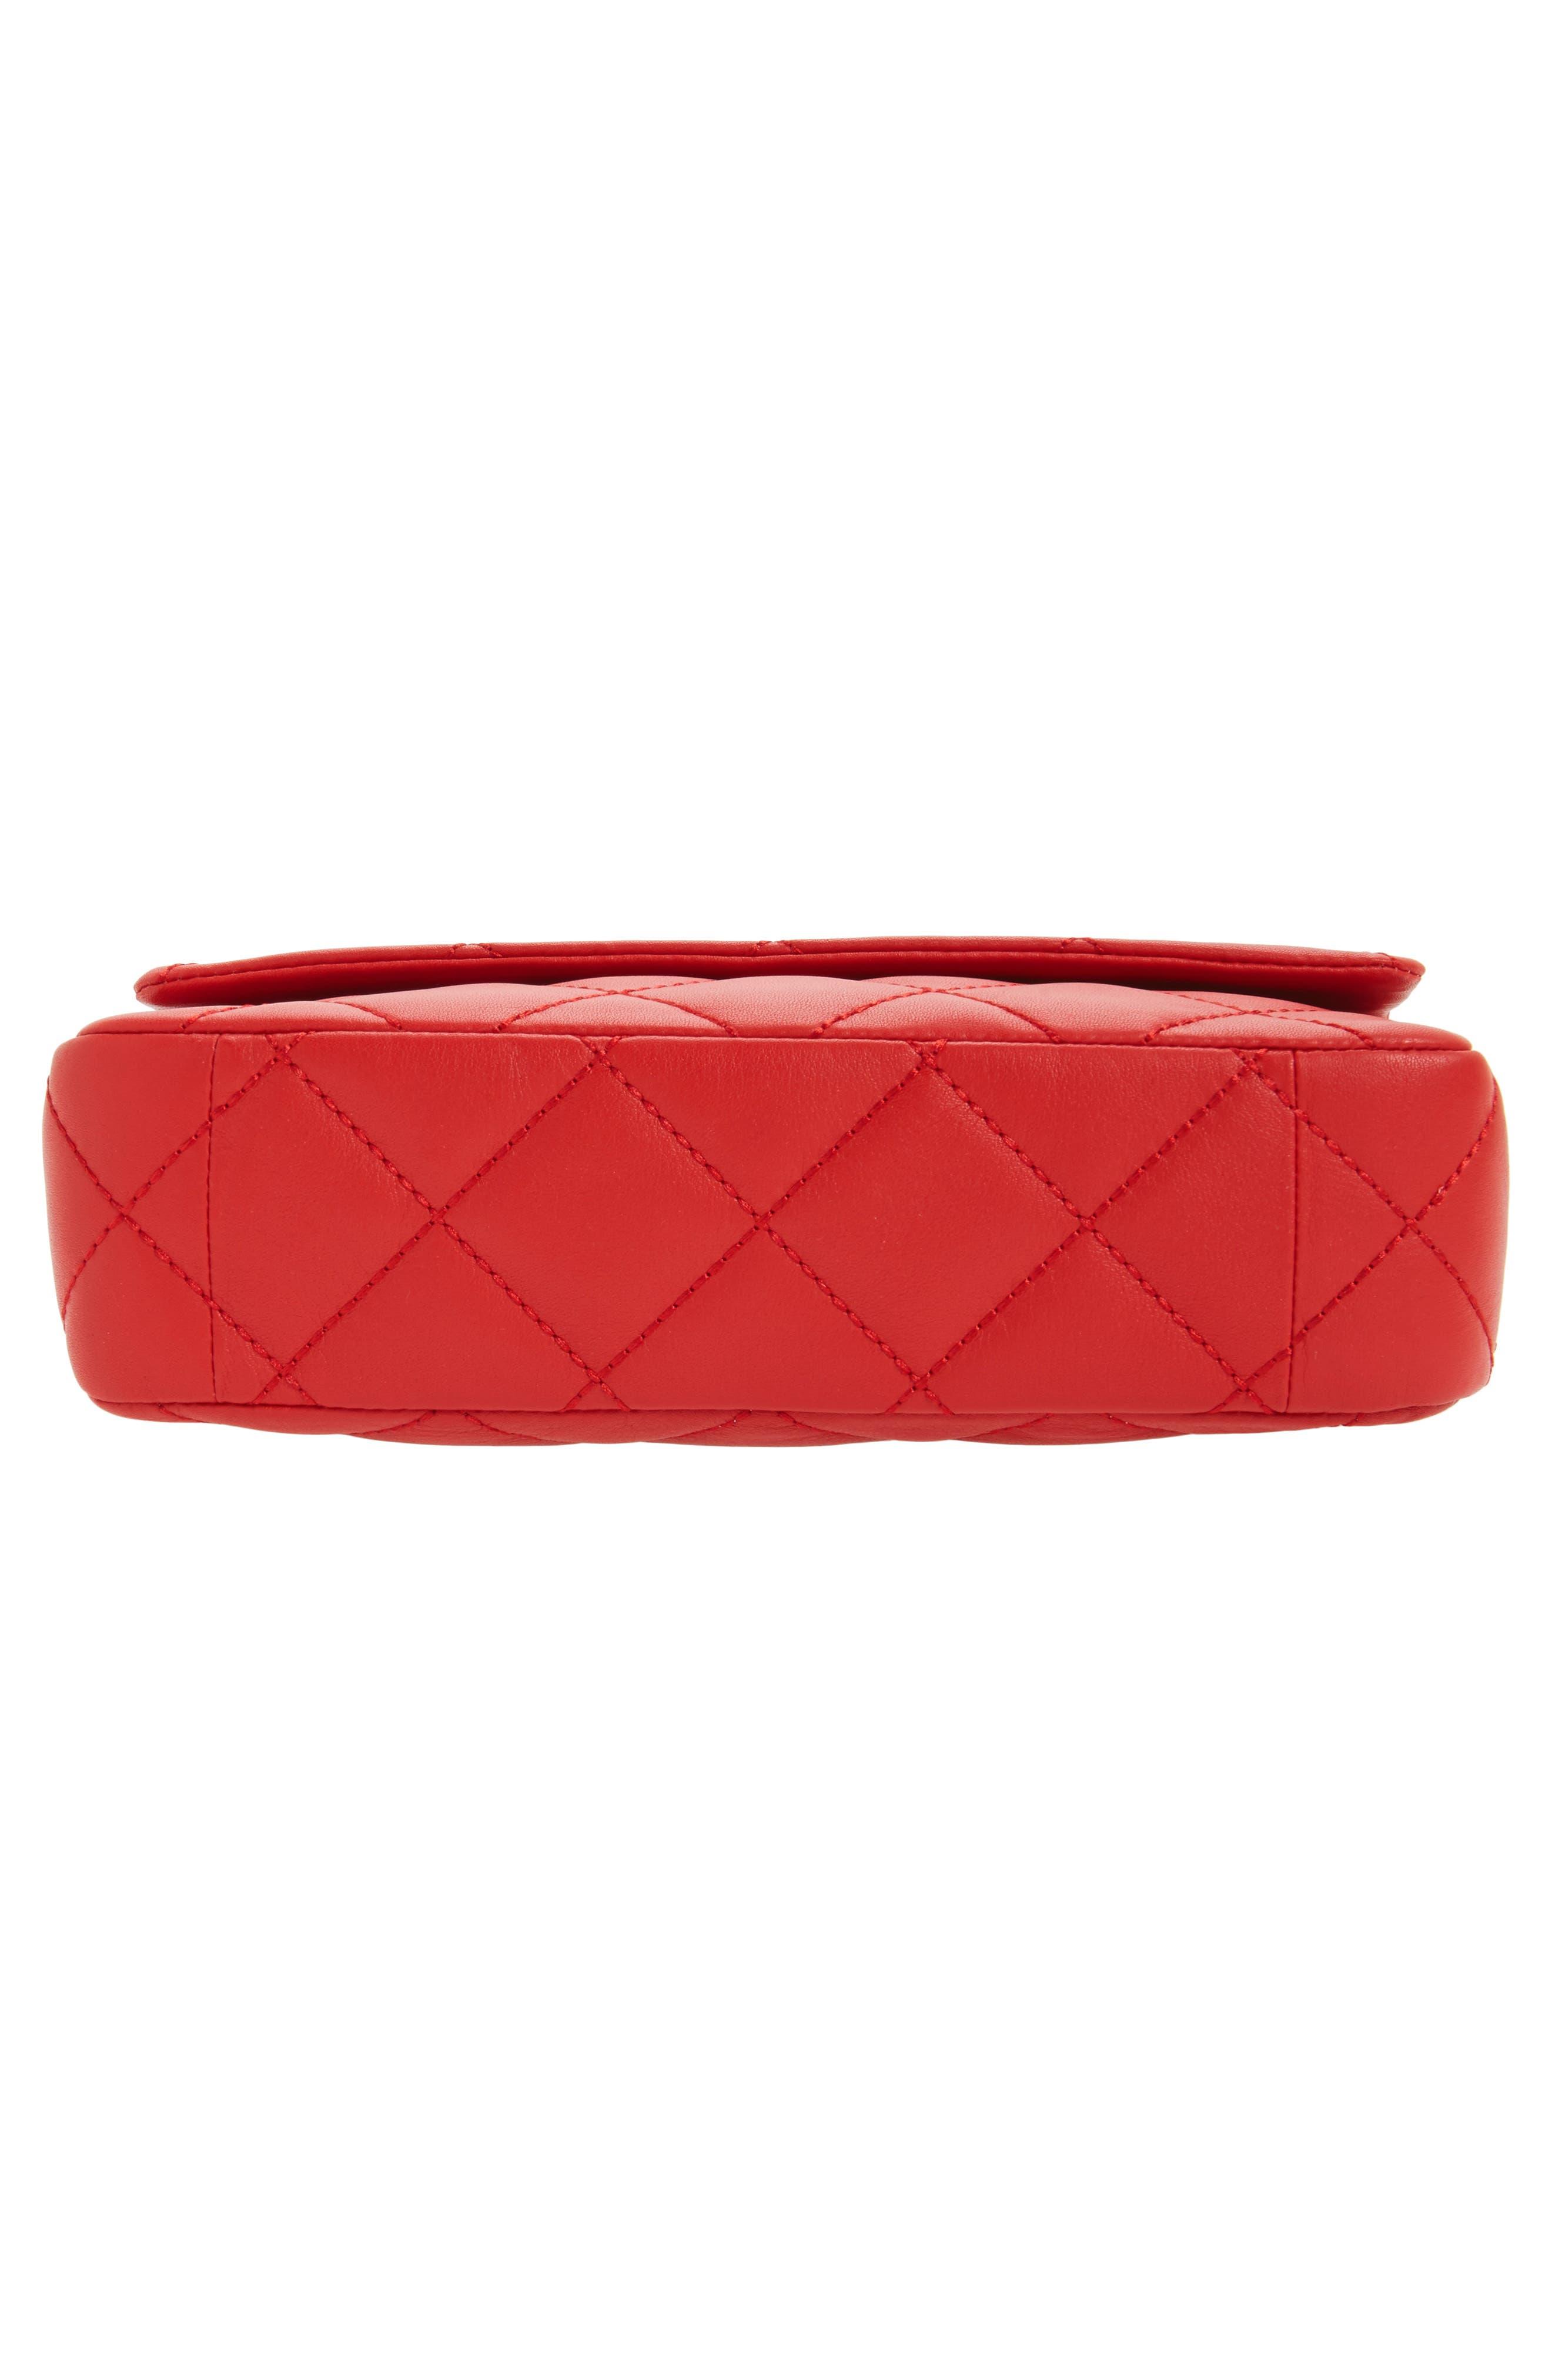 emerson place - serena leather shoulder bag,                             Alternate thumbnail 18, color,